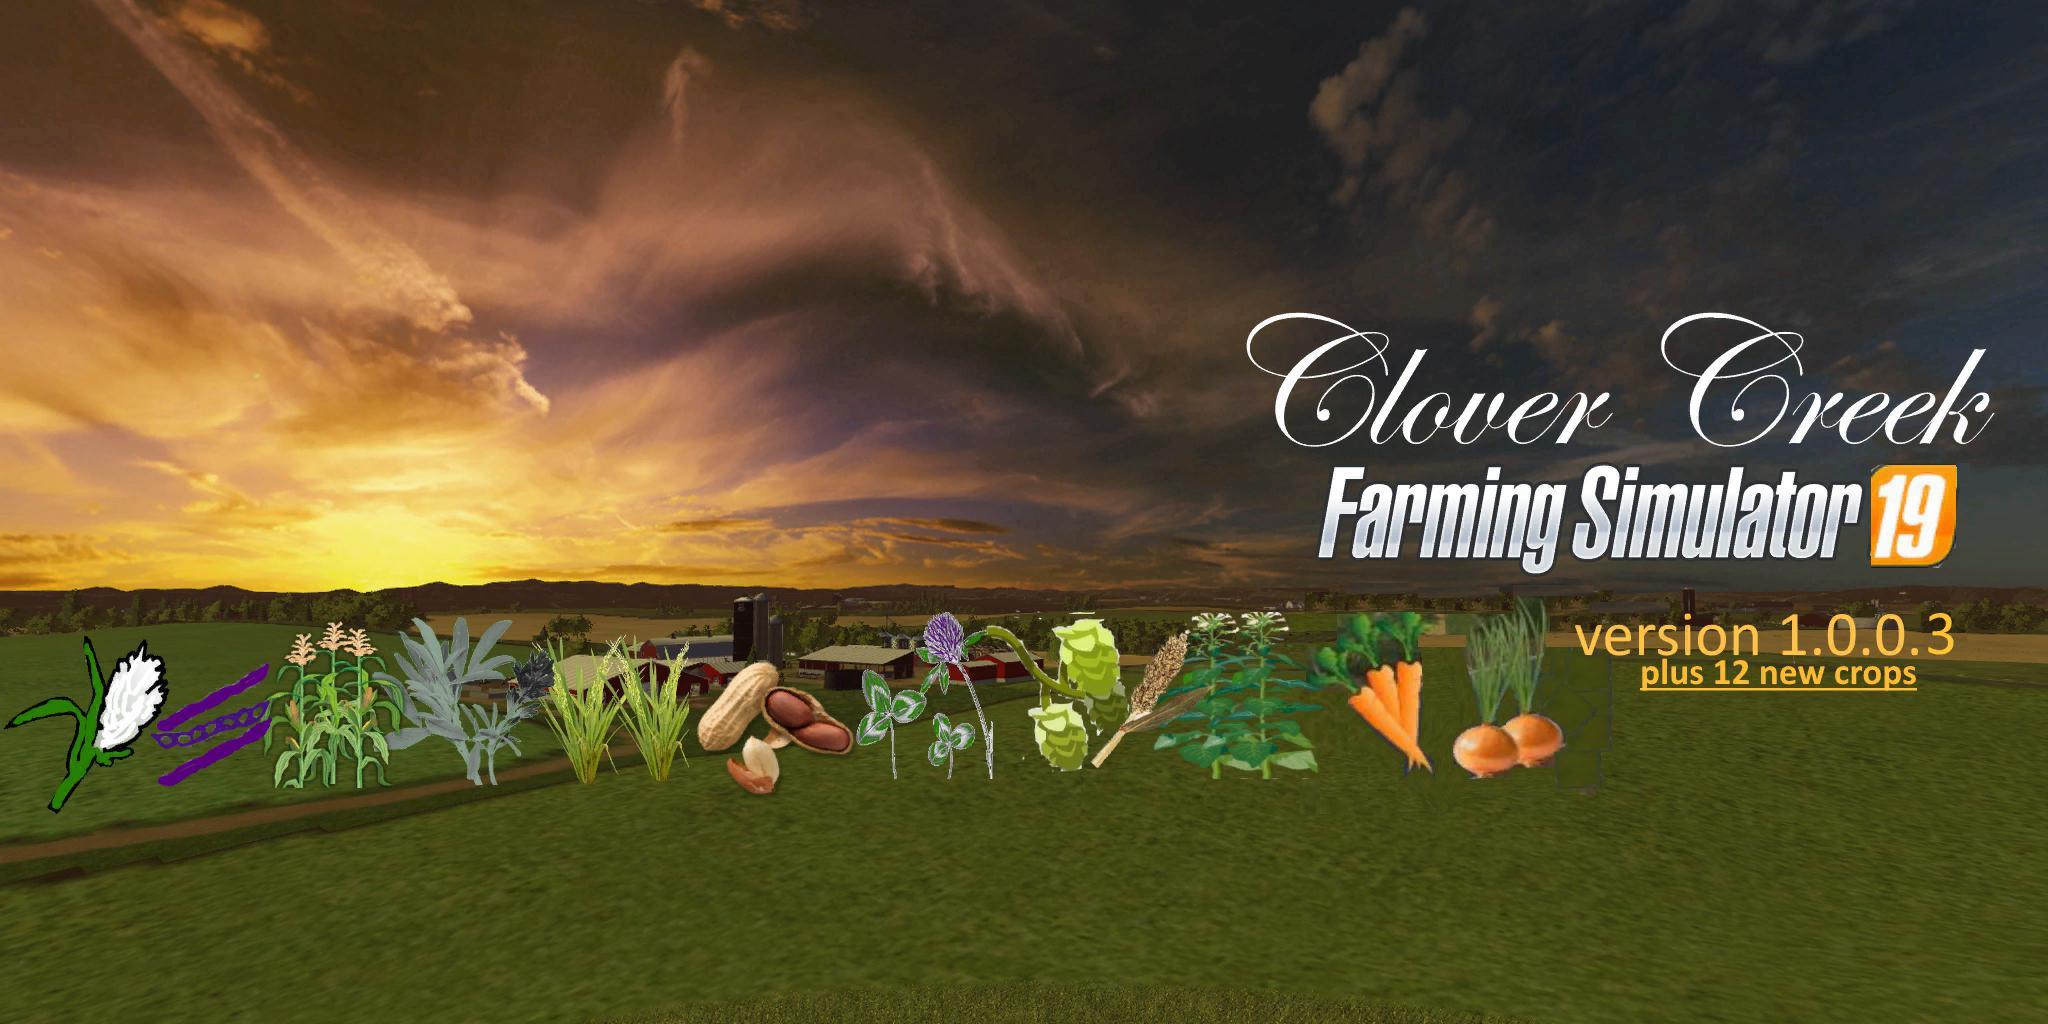 Clover Creek plus 12 crops v 1.0.0.3